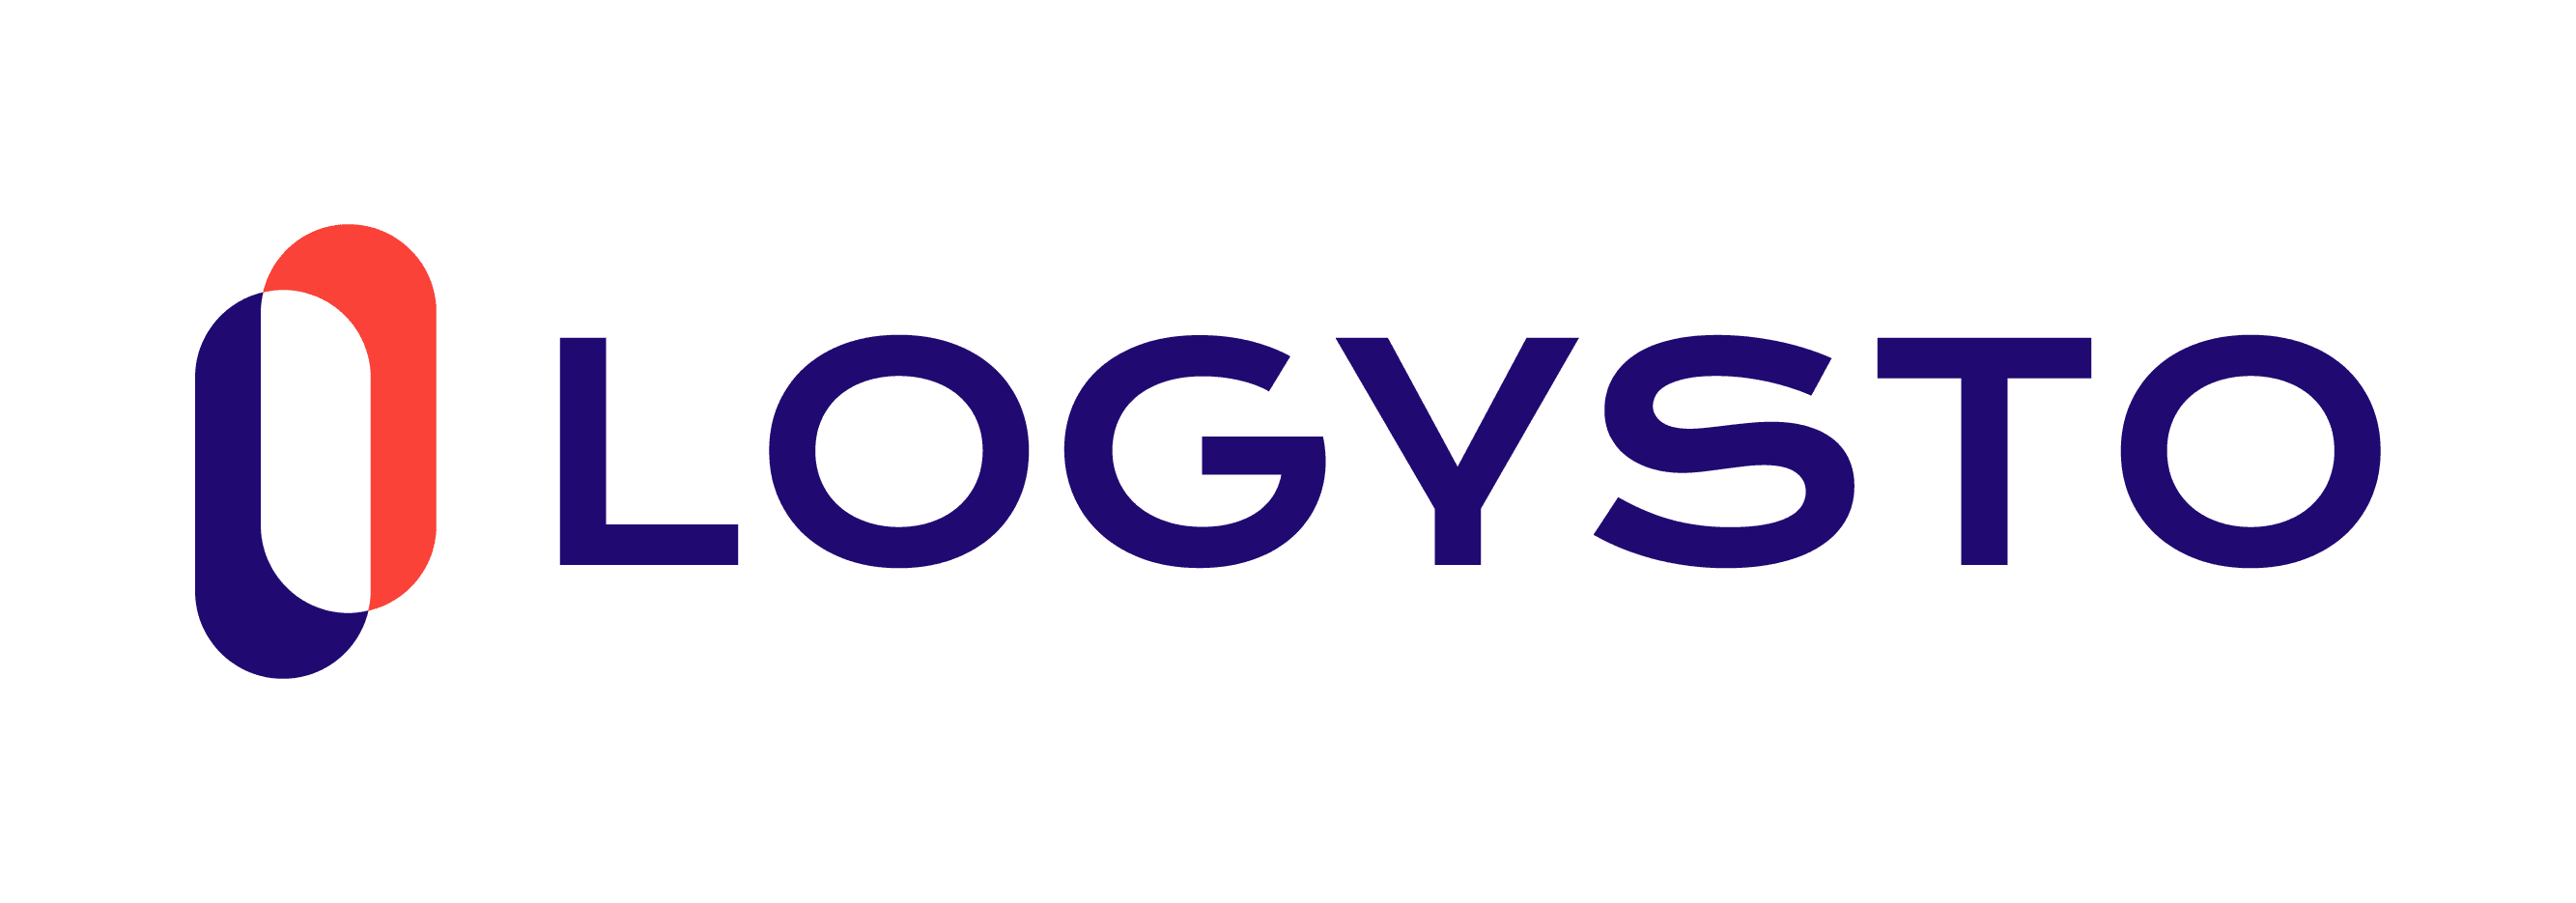 LOGYSTO - Crunchbase Company Profile & Funding